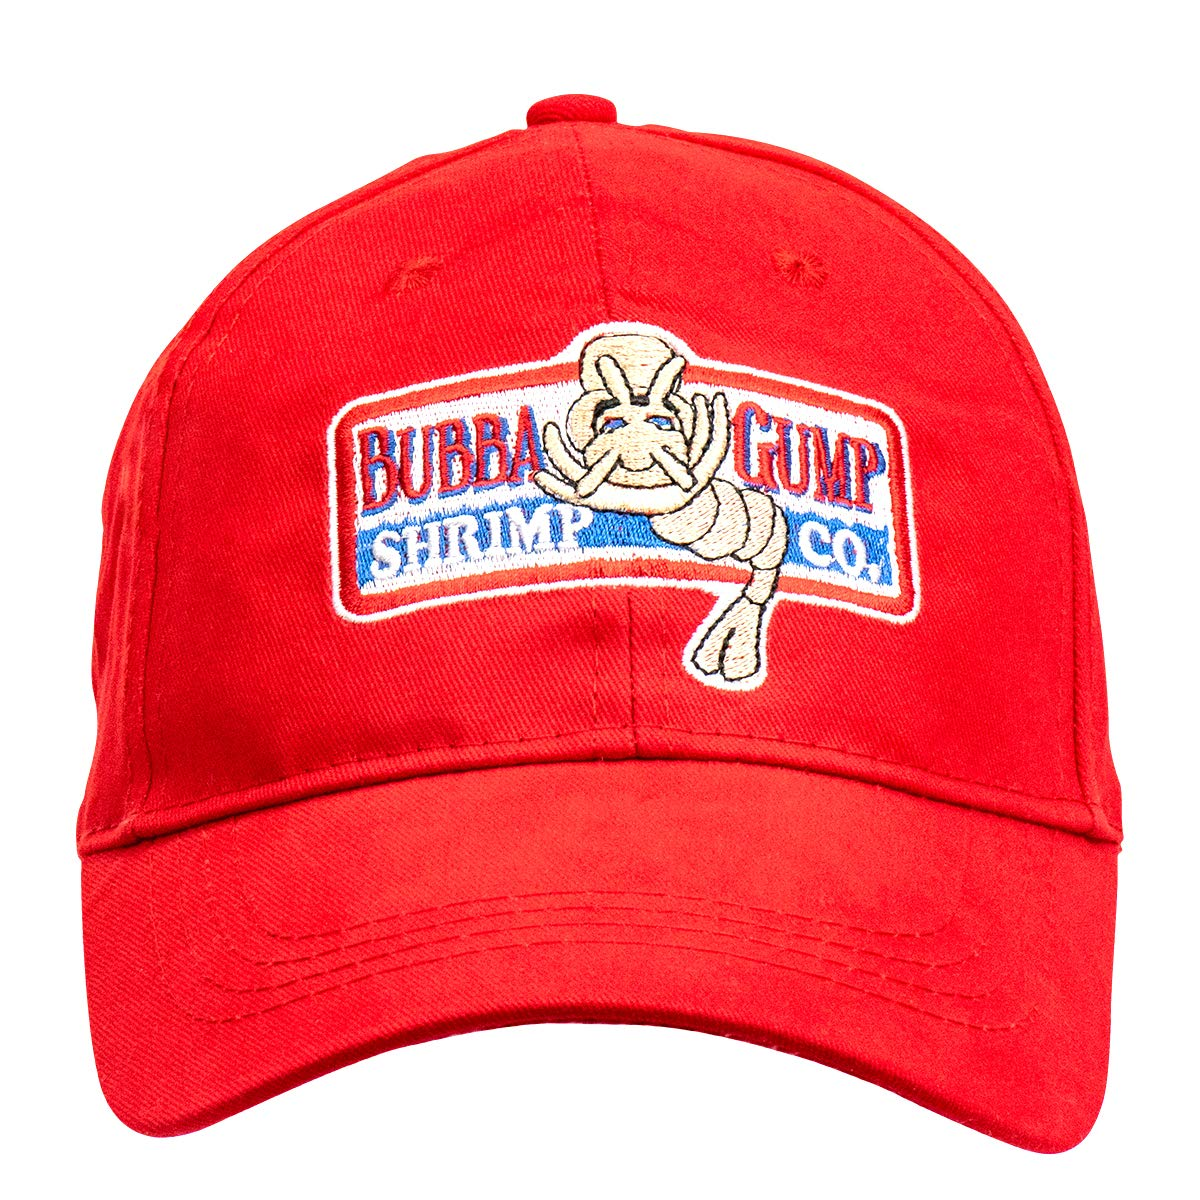 Lackingone Unisex Forrest Gump Cap Flat-Edge Red Baseball Cap